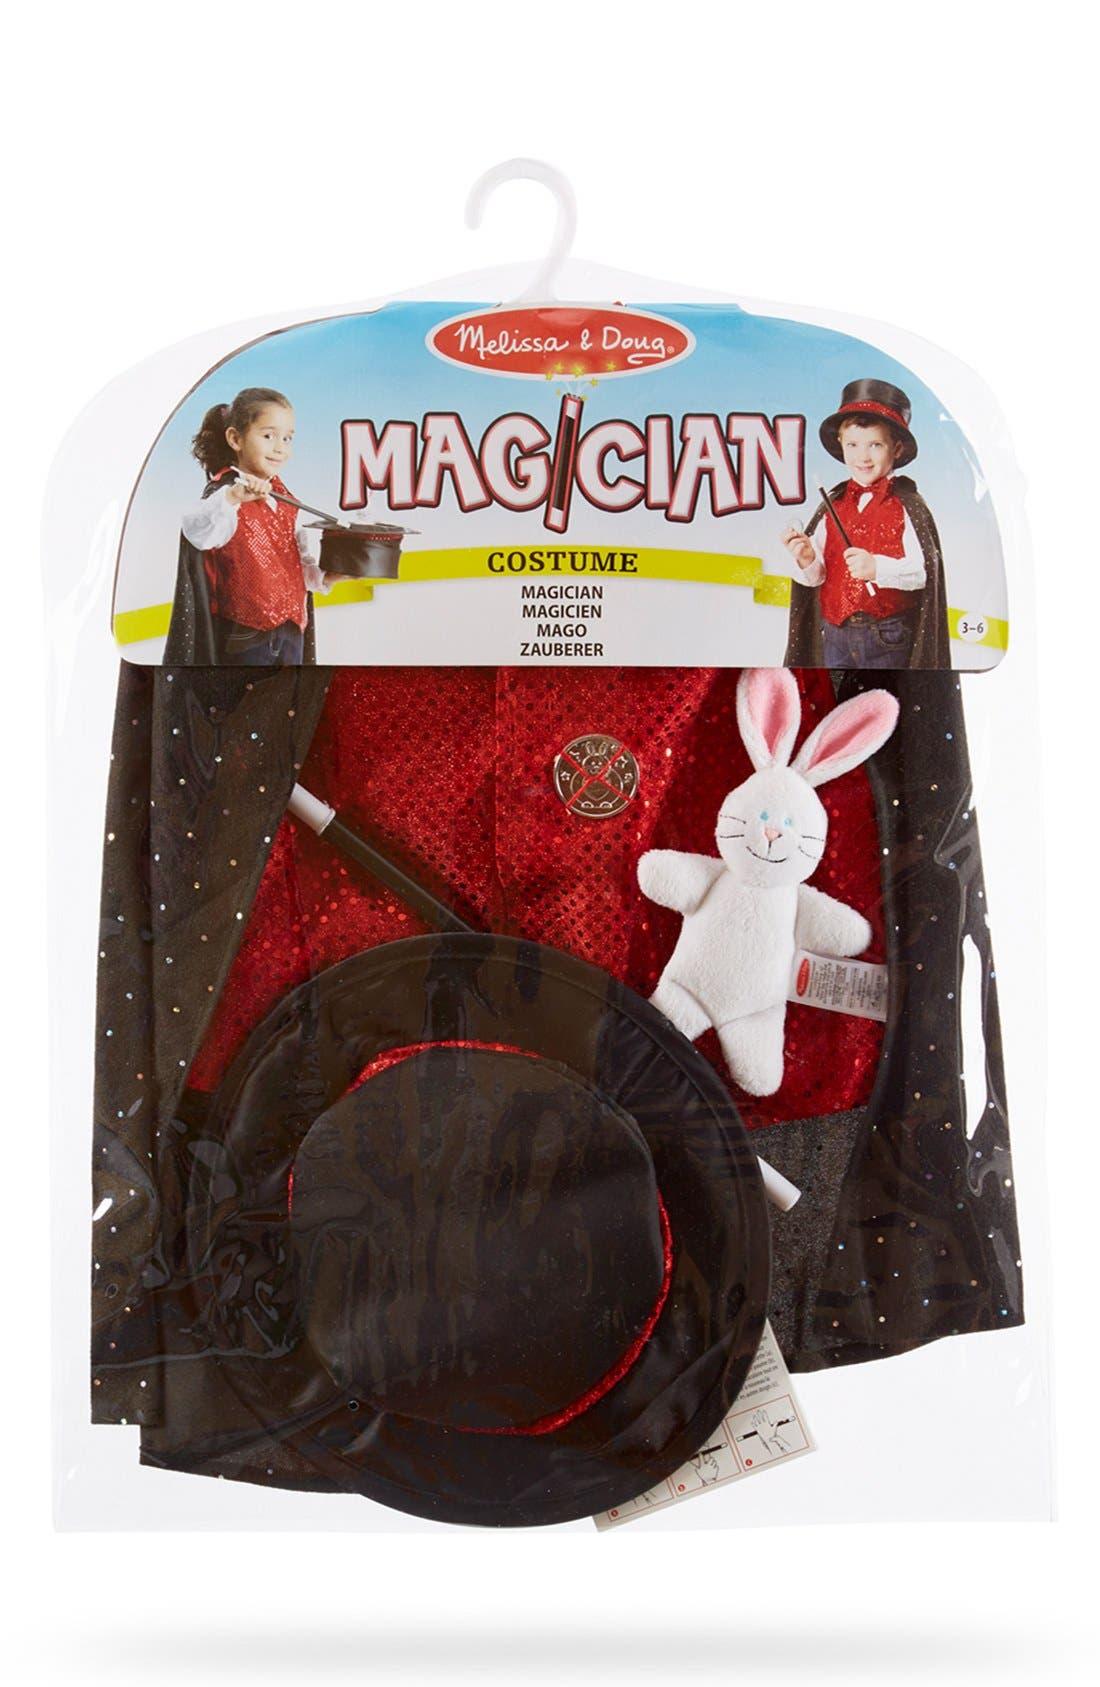 Magician Role Play Set,                             Main thumbnail 1, color,                             001